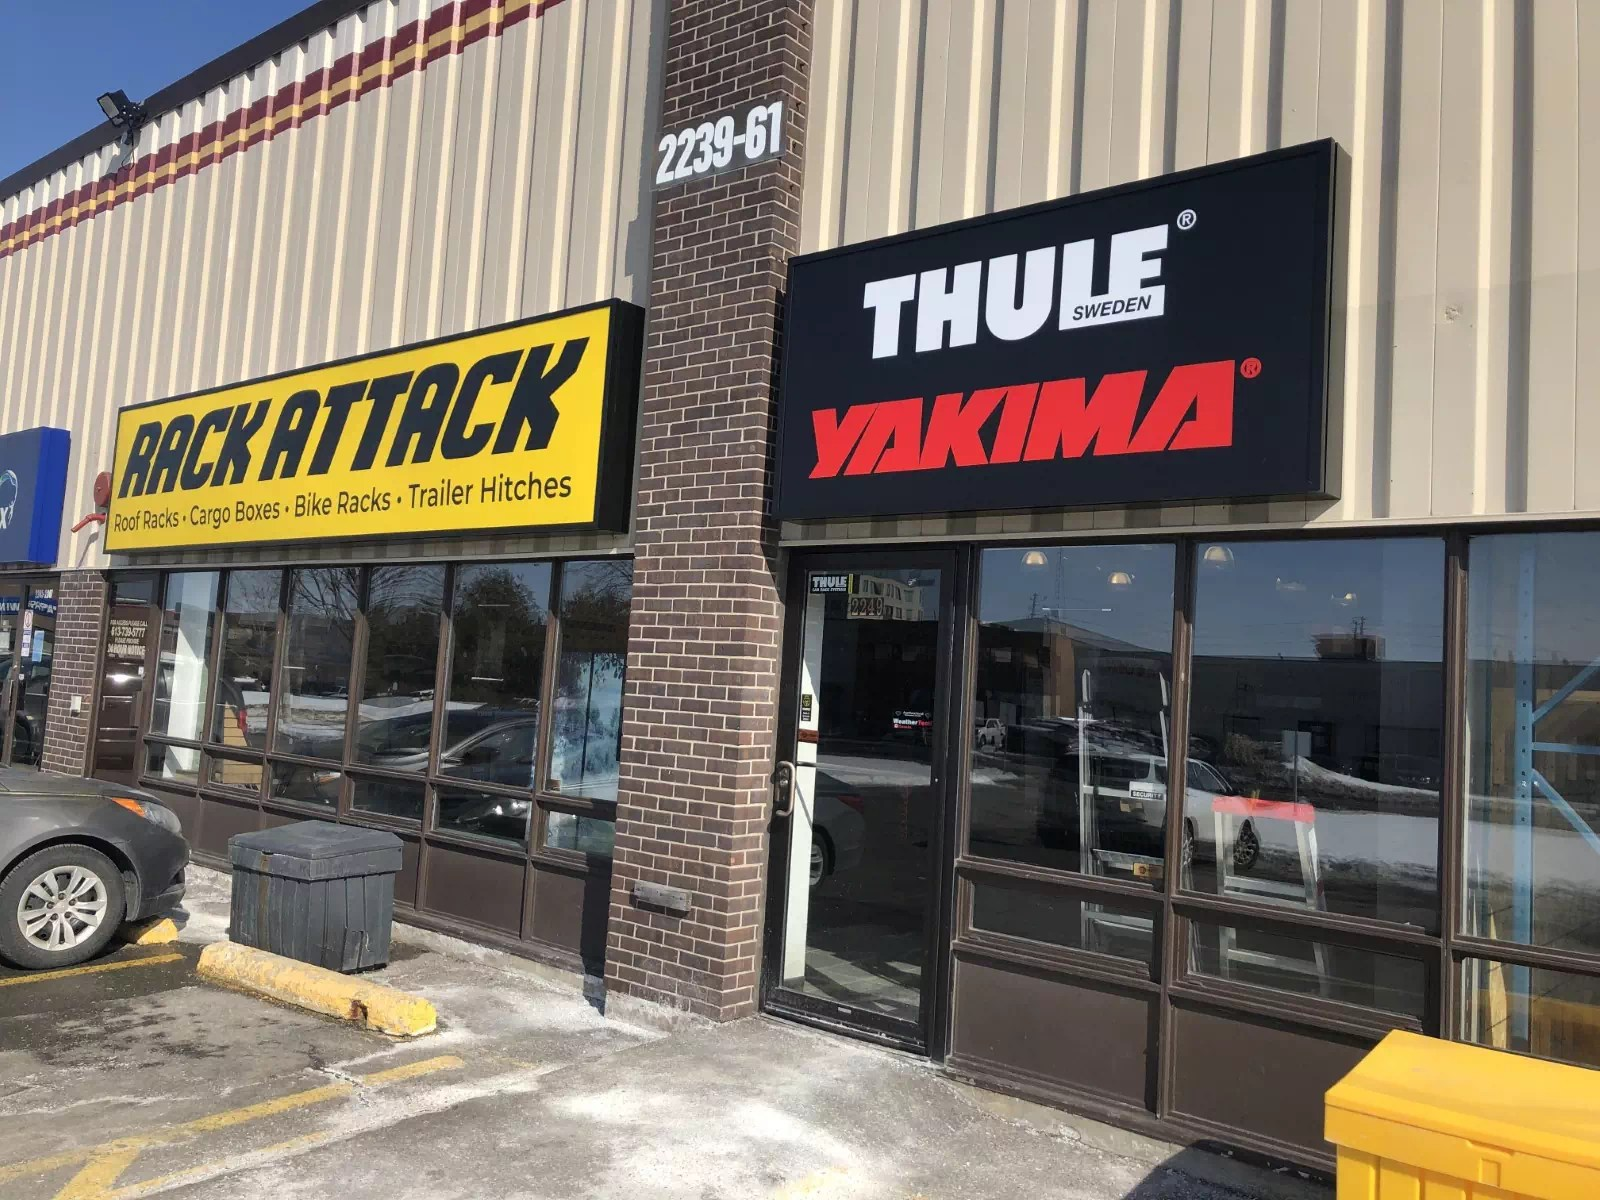 rack attack ottawa address hours